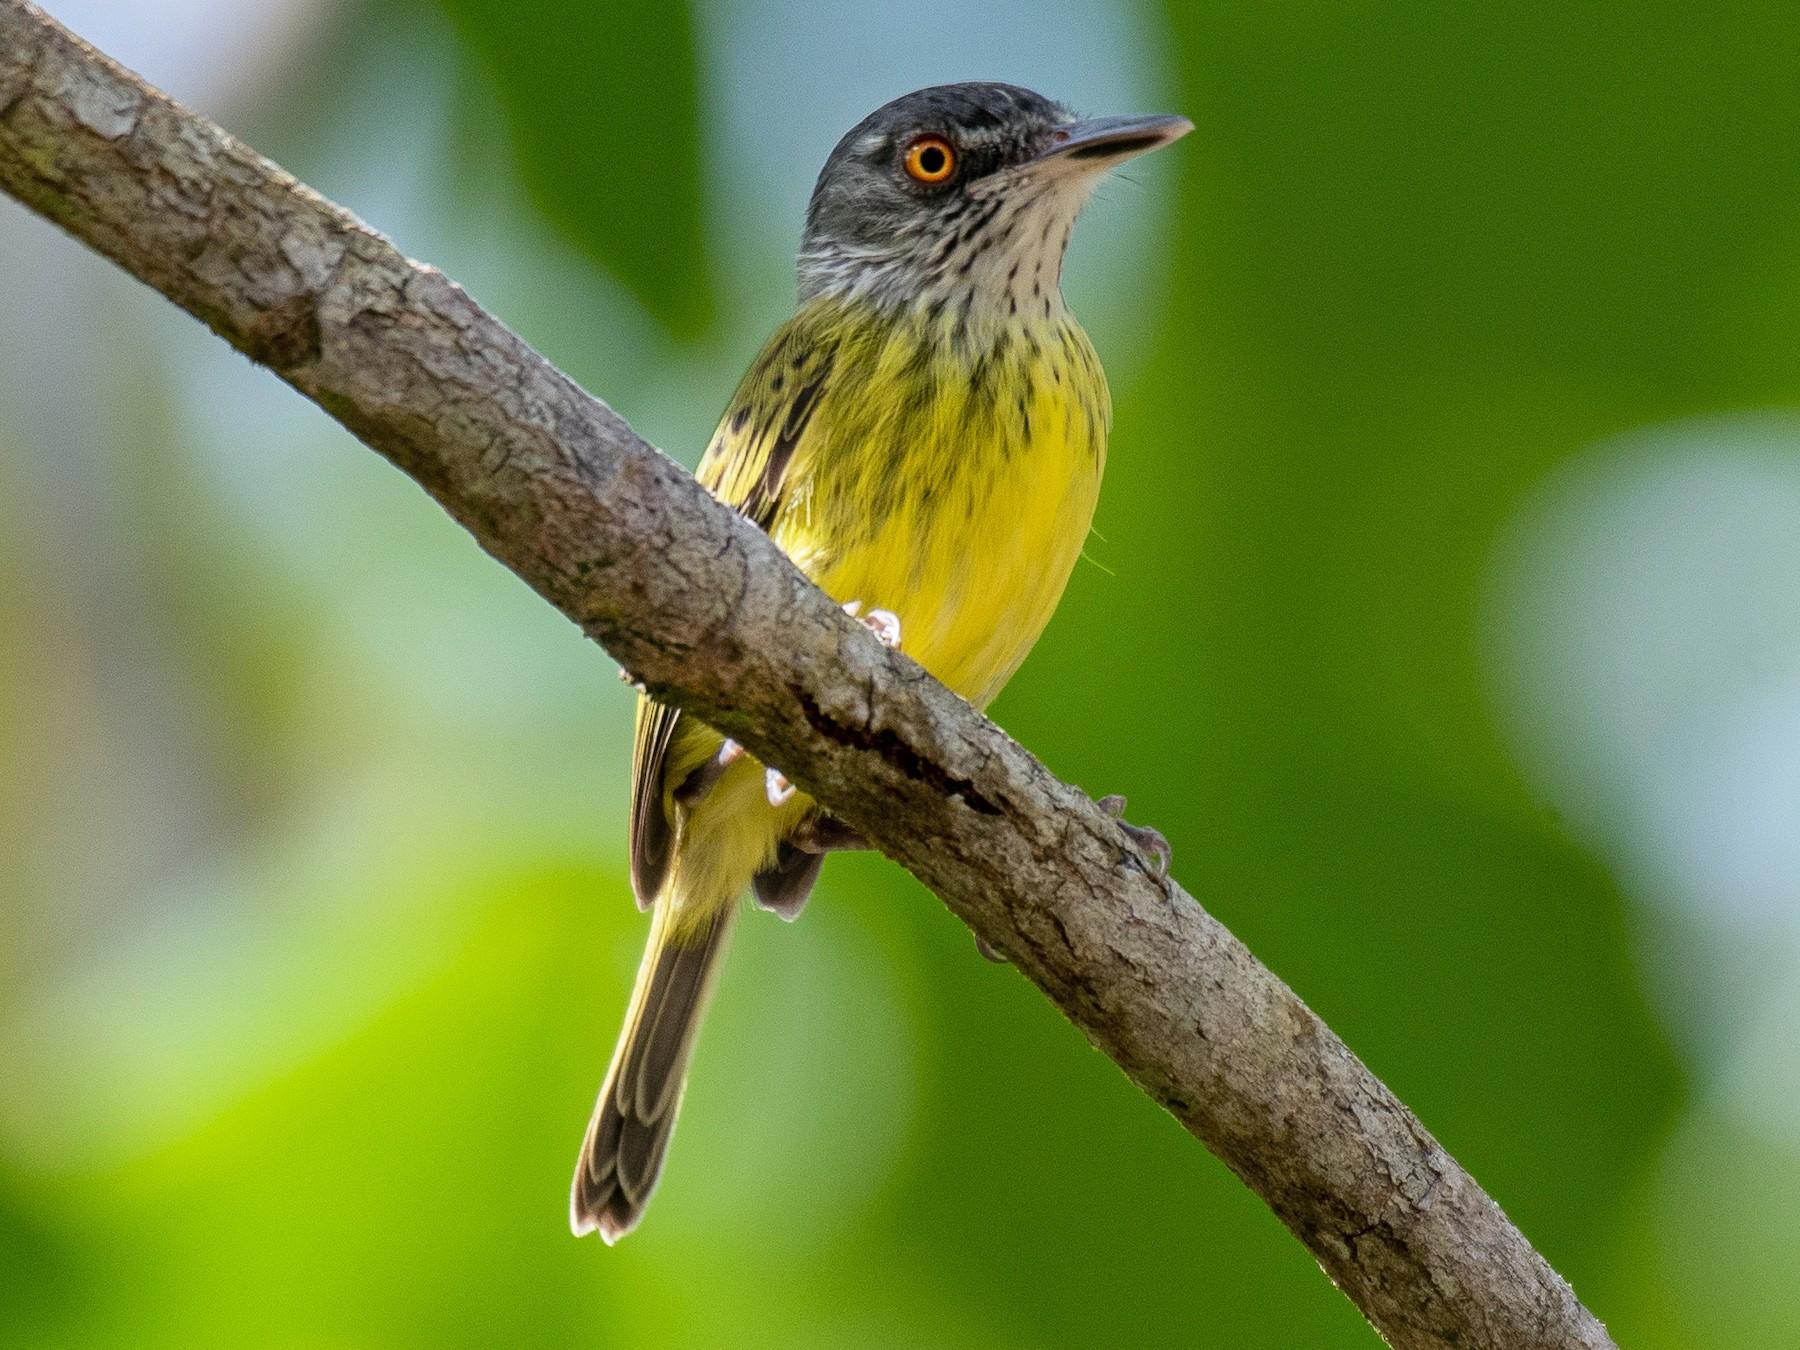 Spotted Tody-Flycatcher - Victor Castanho